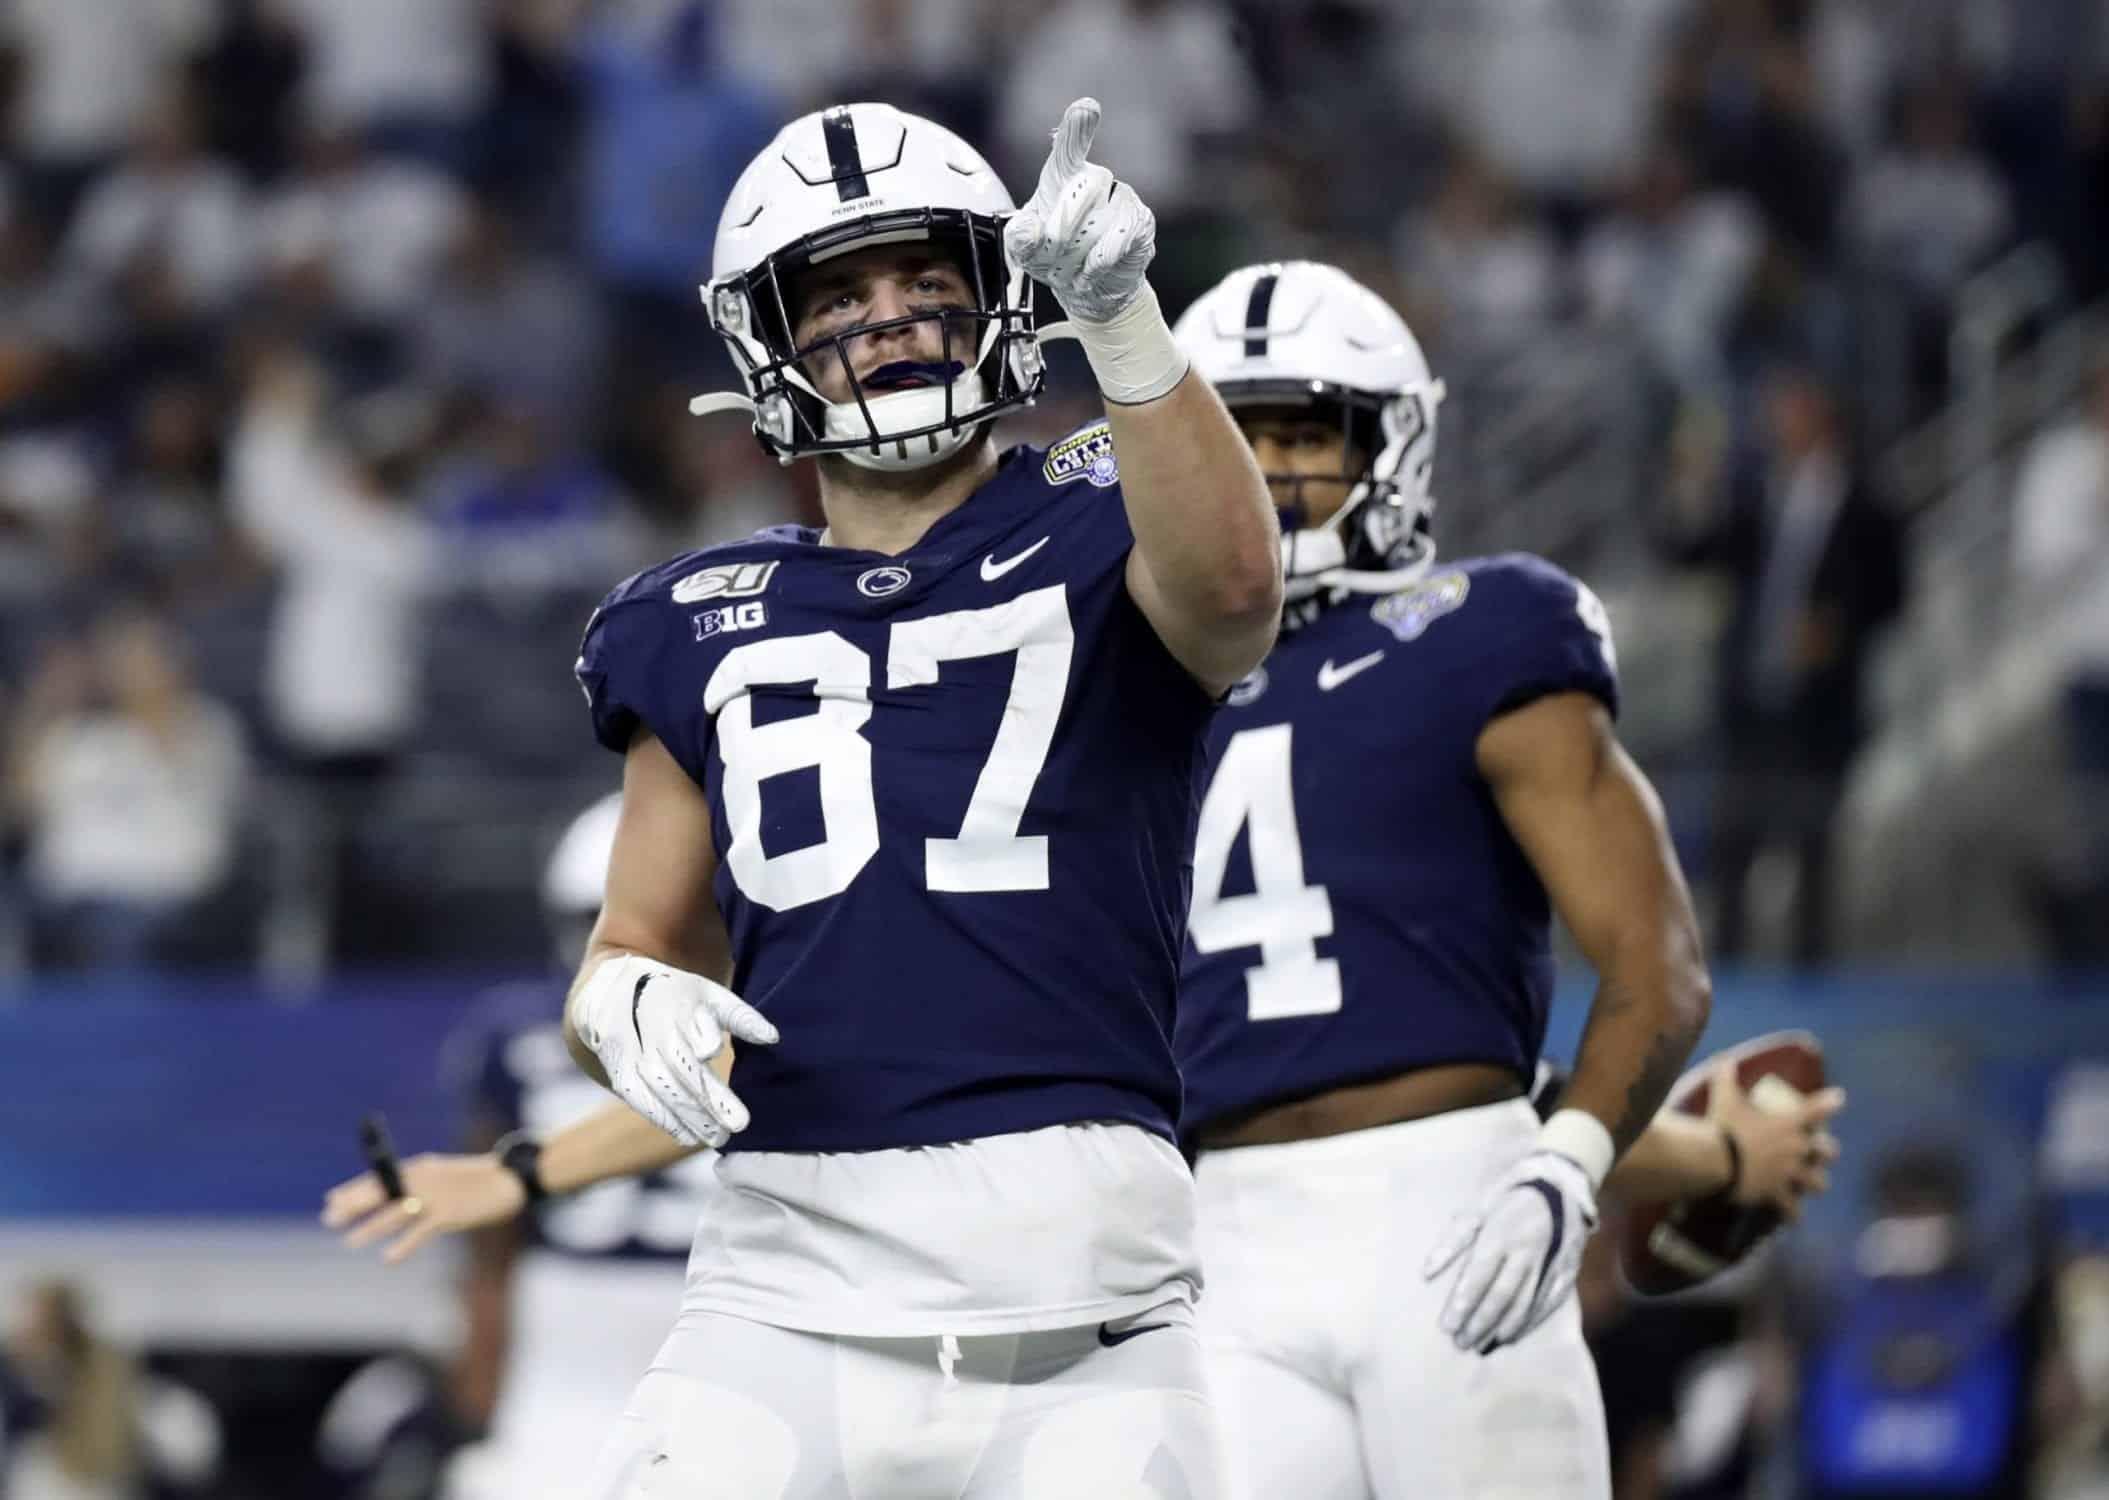 Penn State tight end Pat Freiermuth a top option for 2021